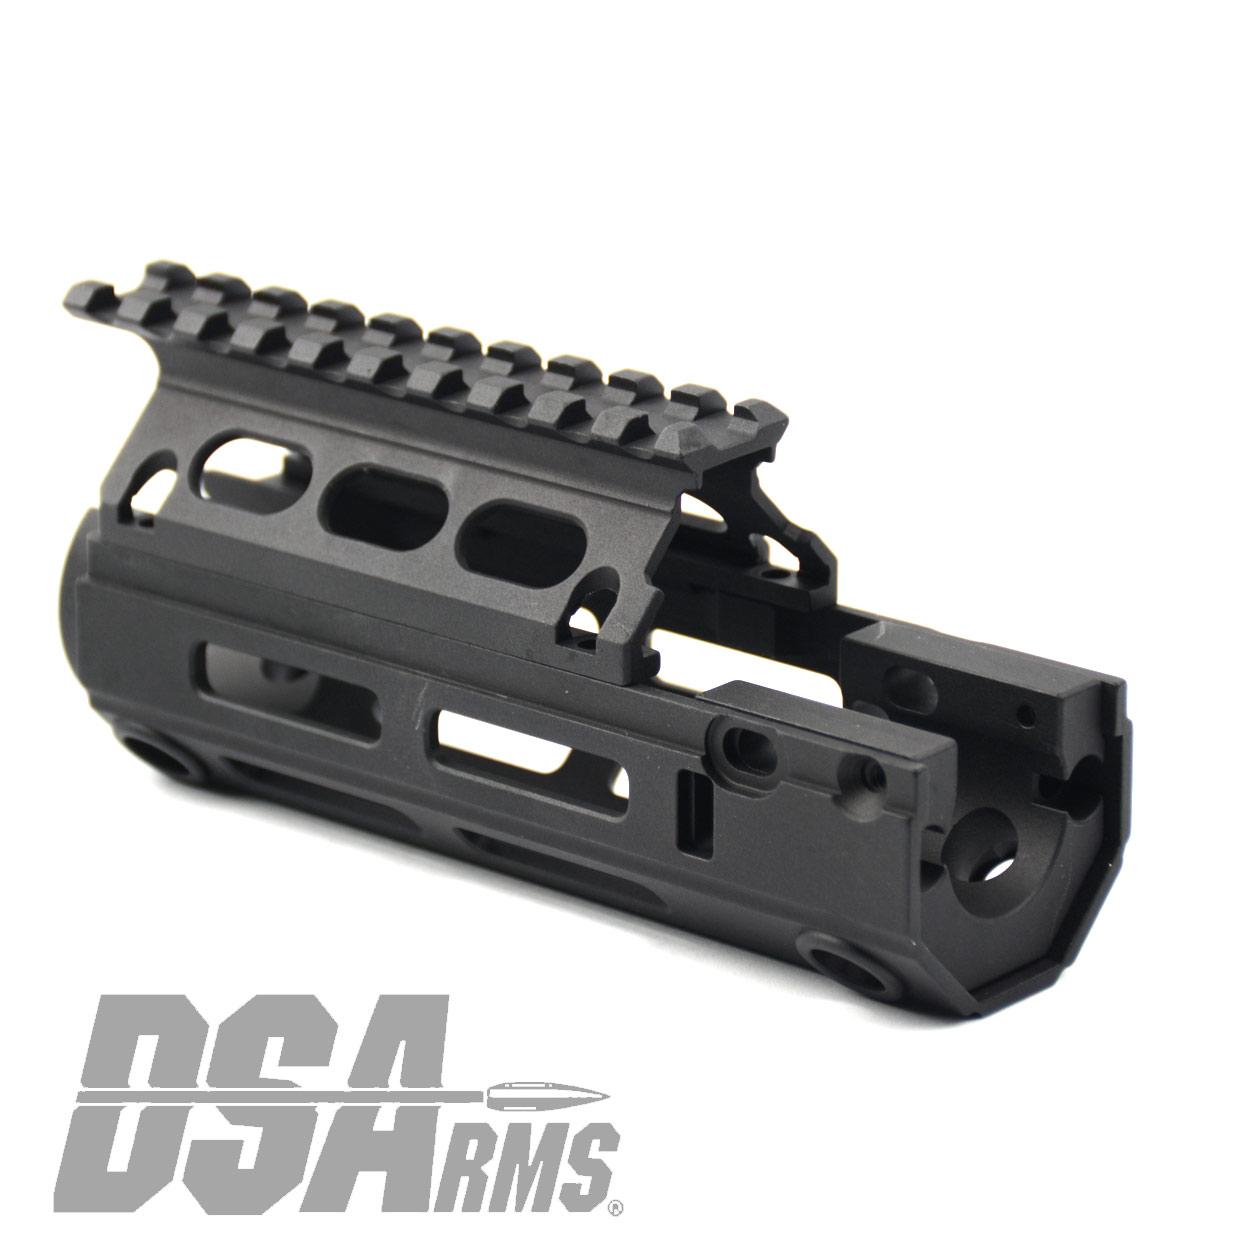 DS ARMS DEBUTS NEW SA58 METRIC PISTOL LENGTH GAS SYSTEM M-LOK INTERFACE HANDGUARDS!!!